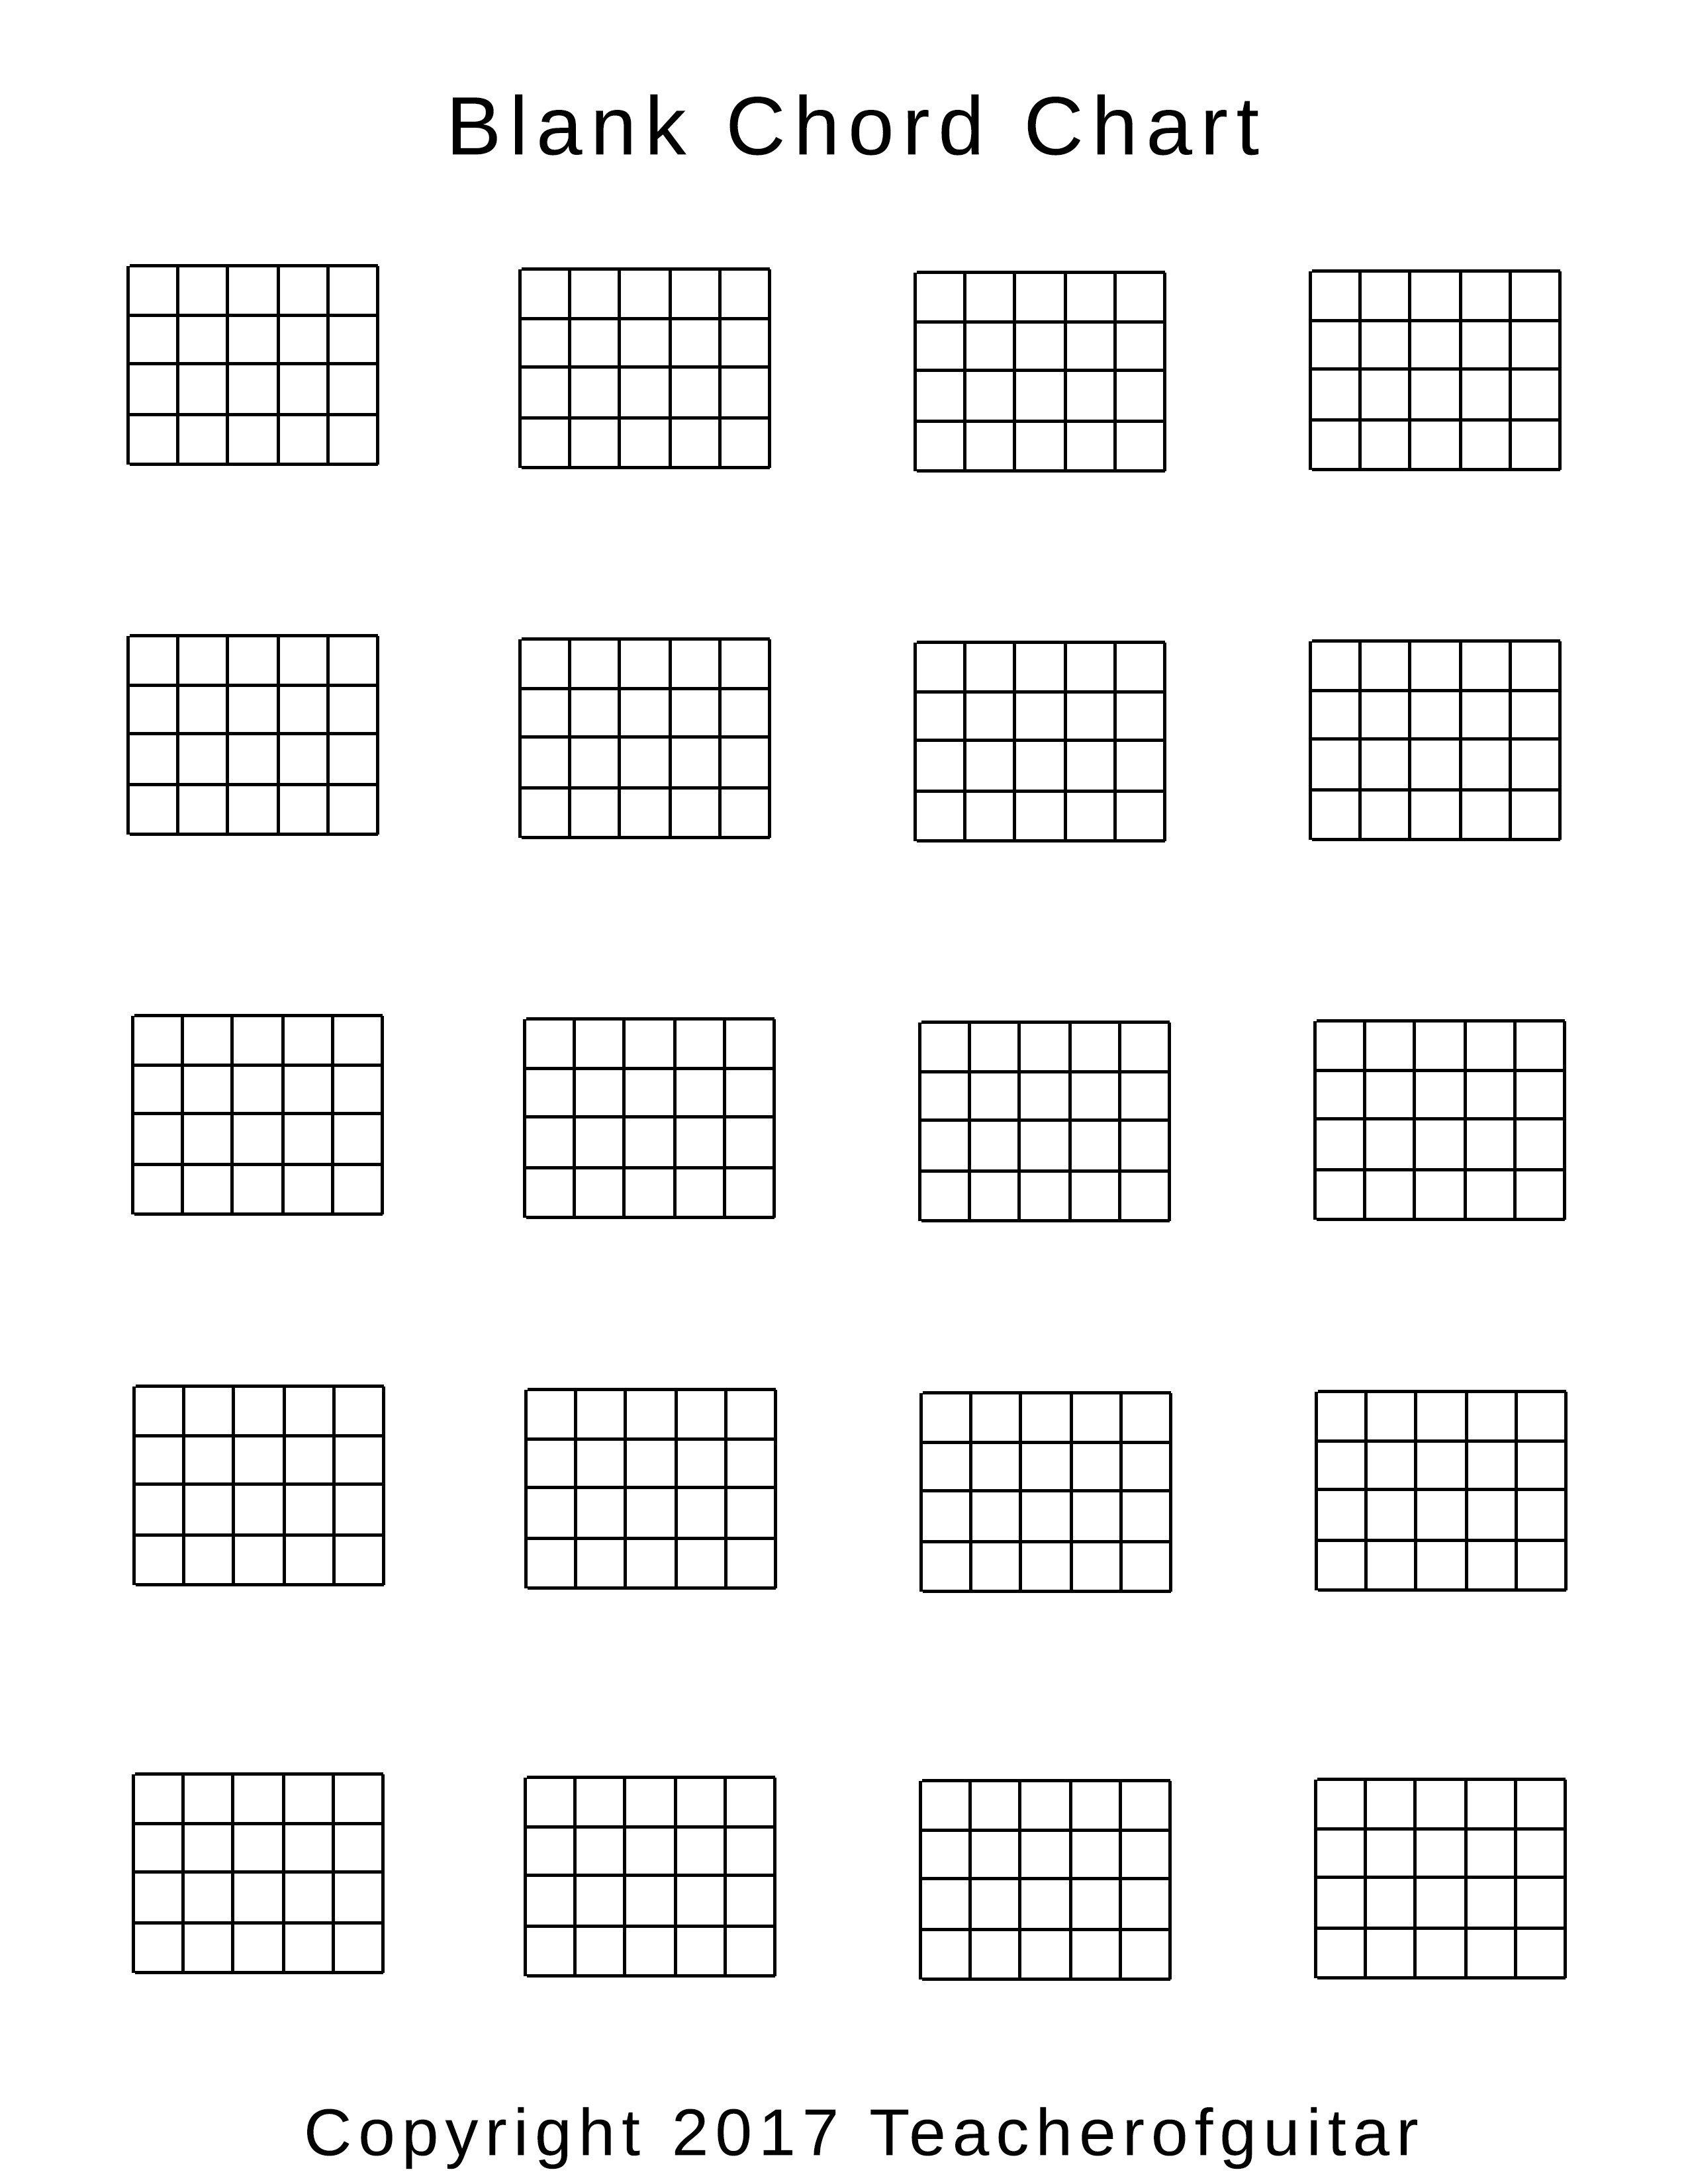 Blank Guitar Chord Chart Blank Chord Chart Teacher Of Guitar